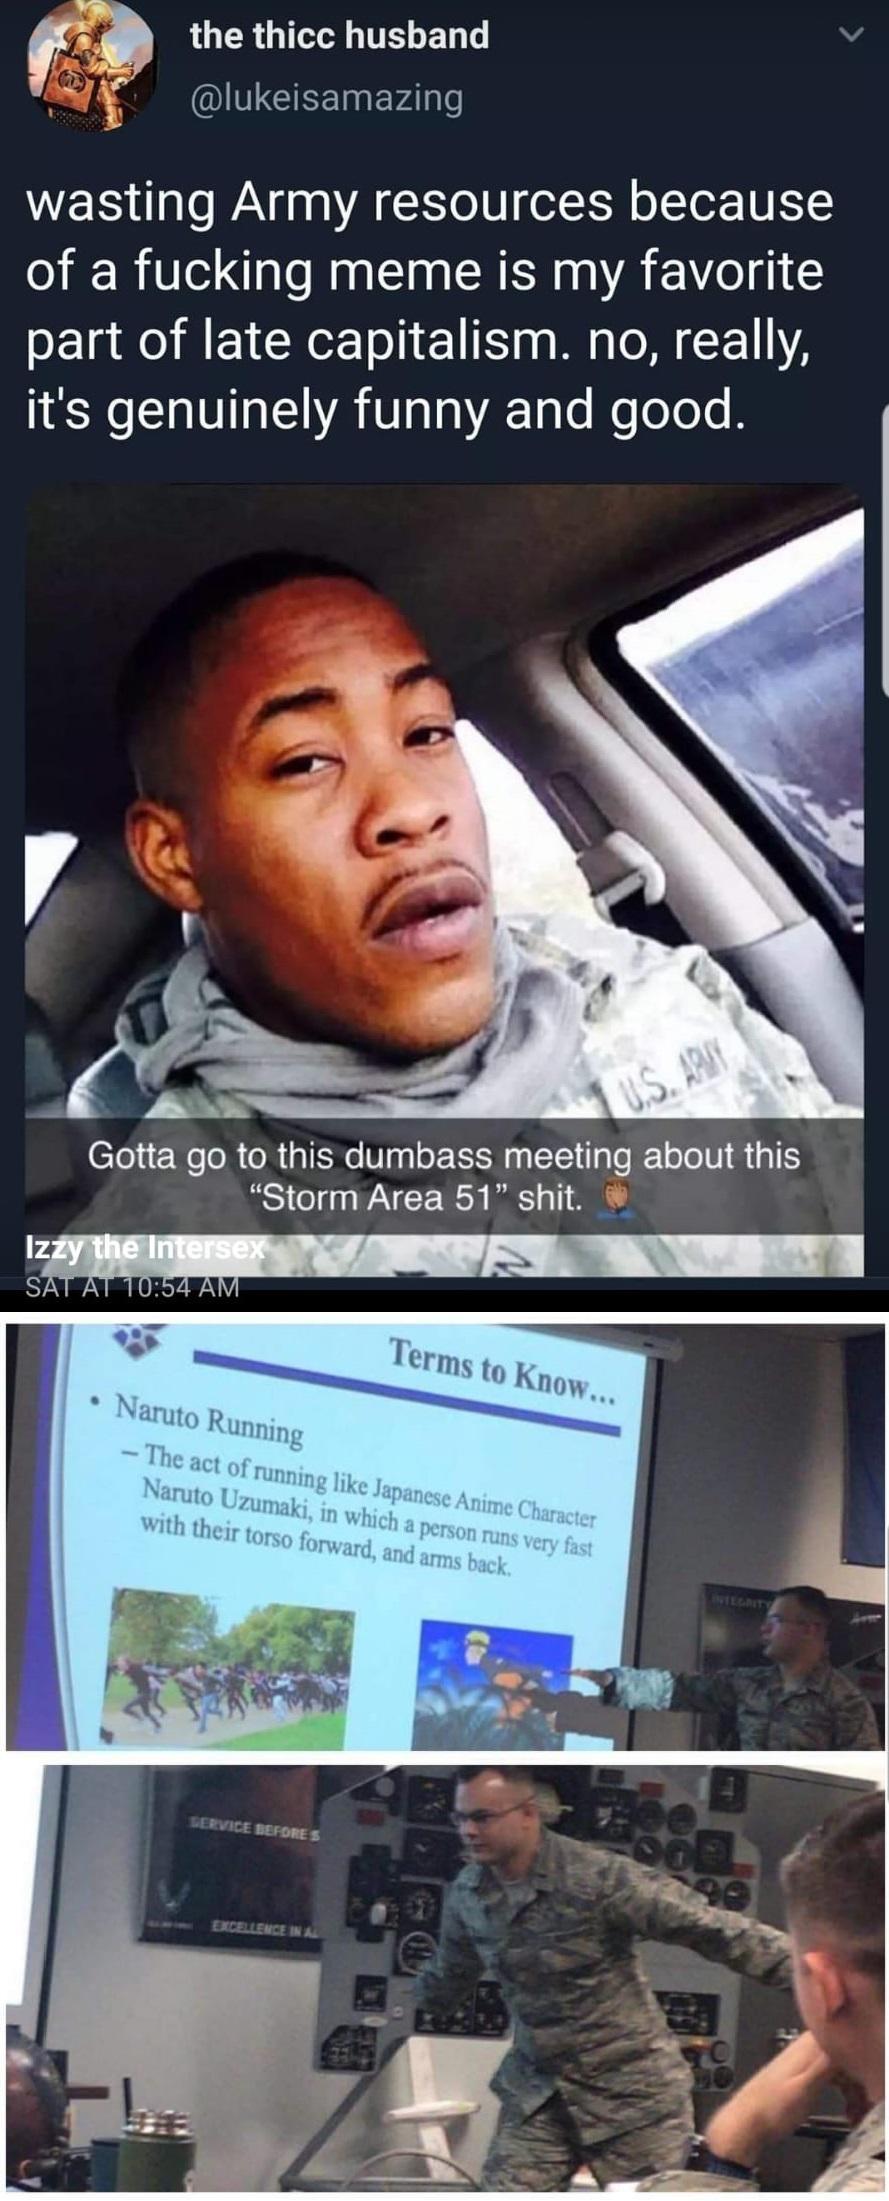 Area 51 naruto run meme